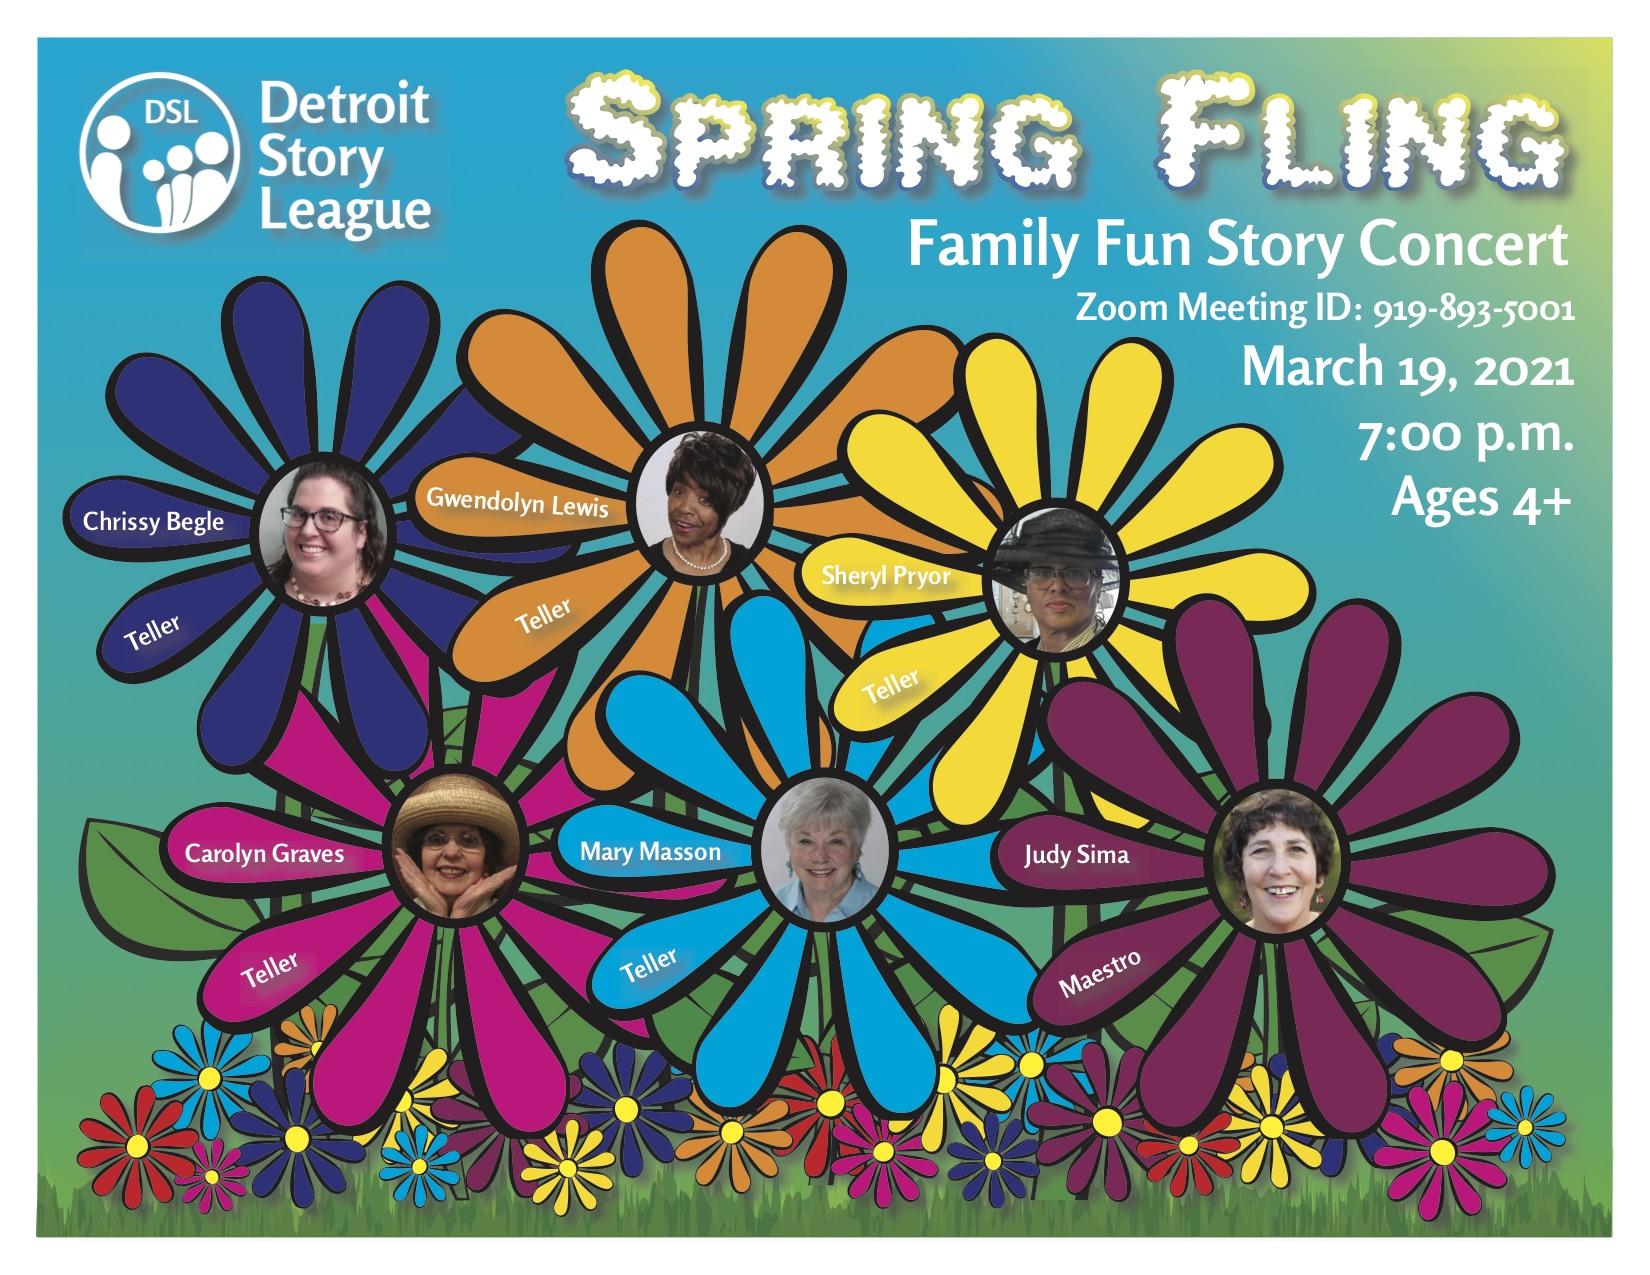 detroit-story-league-spring-fling